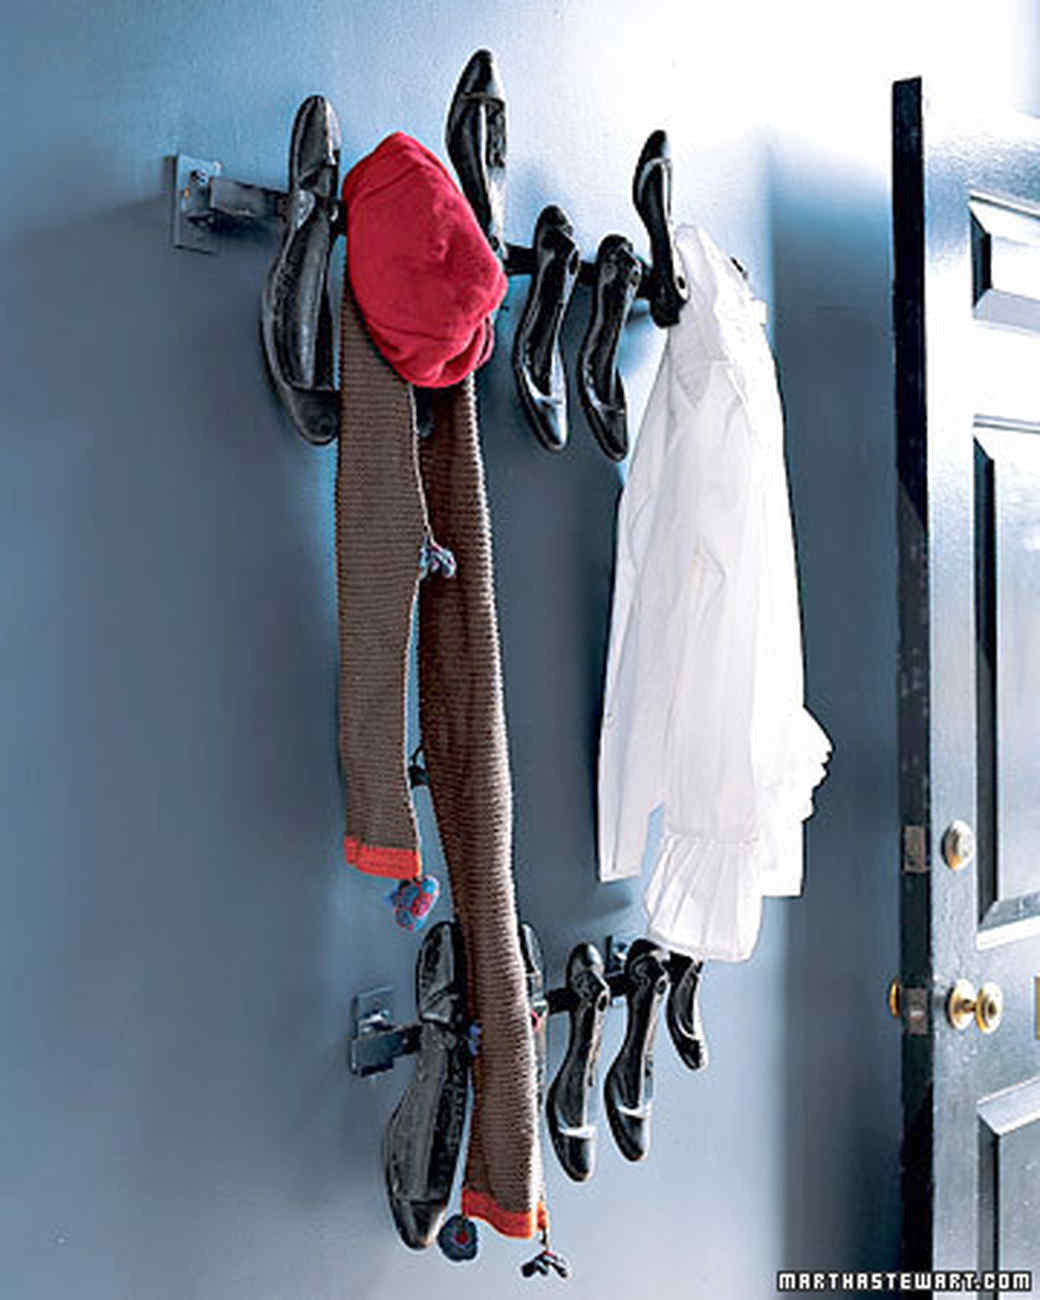 mpa103581_0108_coat_hooks.jpg